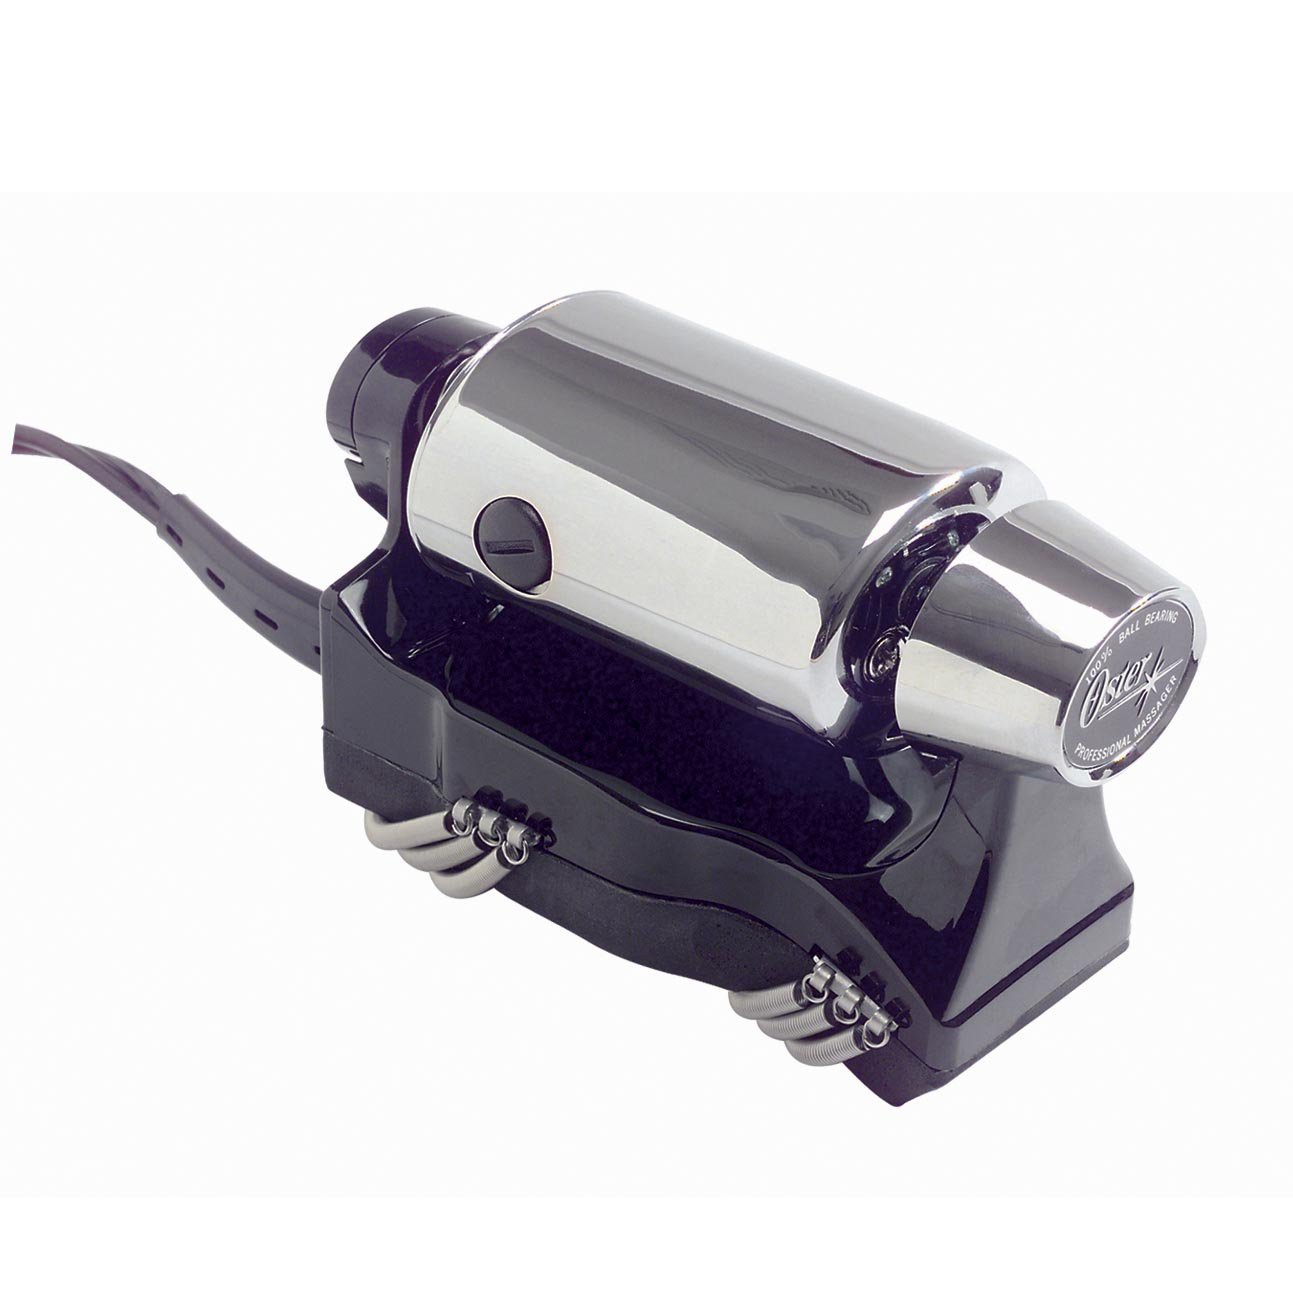 Handheld vibrating massager